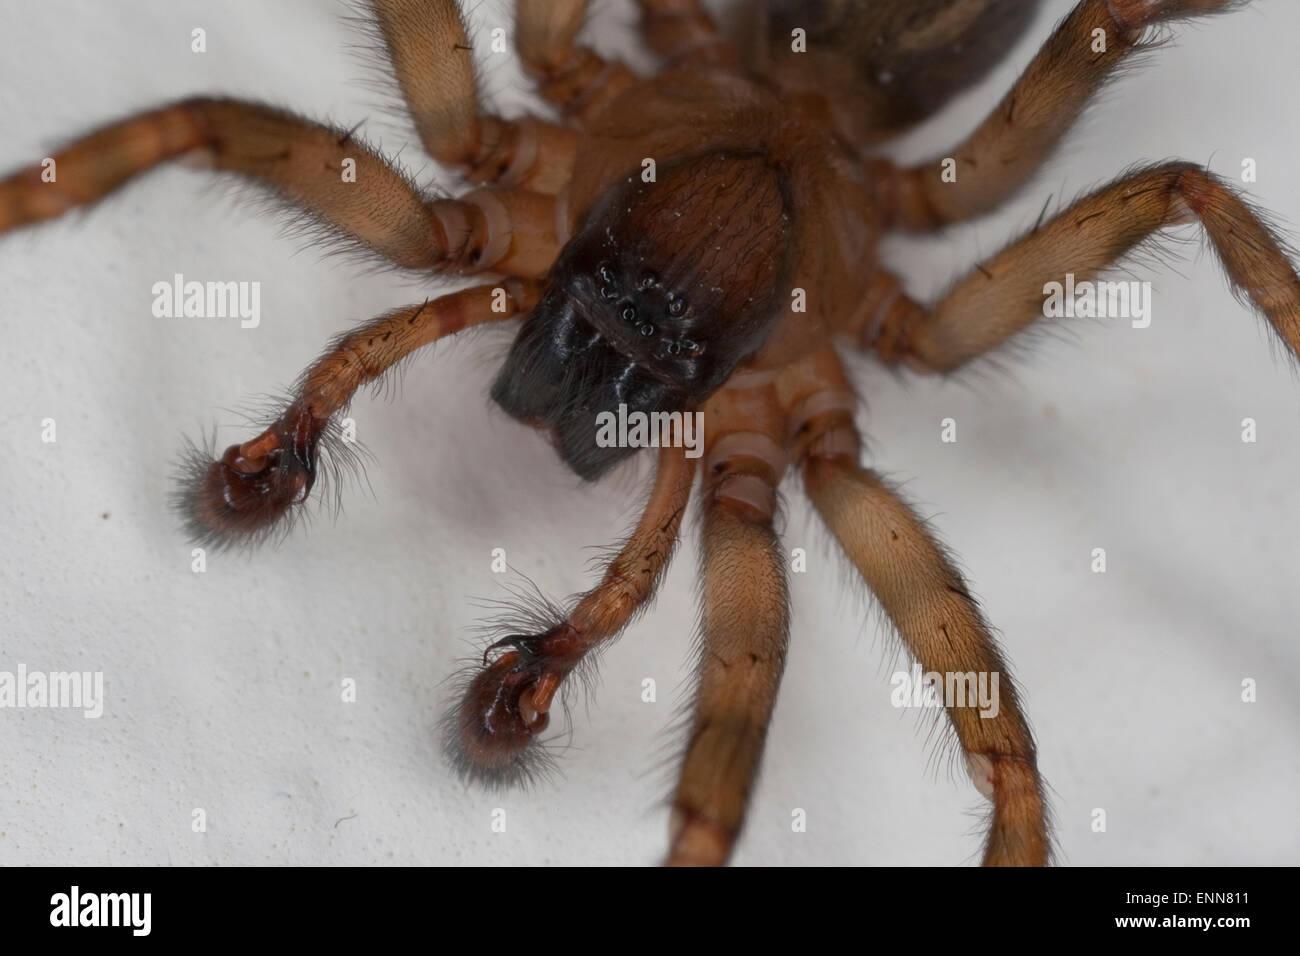 Lace weaver spider, House spider, male, Fensterspinne, Finsterspinne, Kellerspinne, Portrait, Männchen, Amaurobius - Stock Image